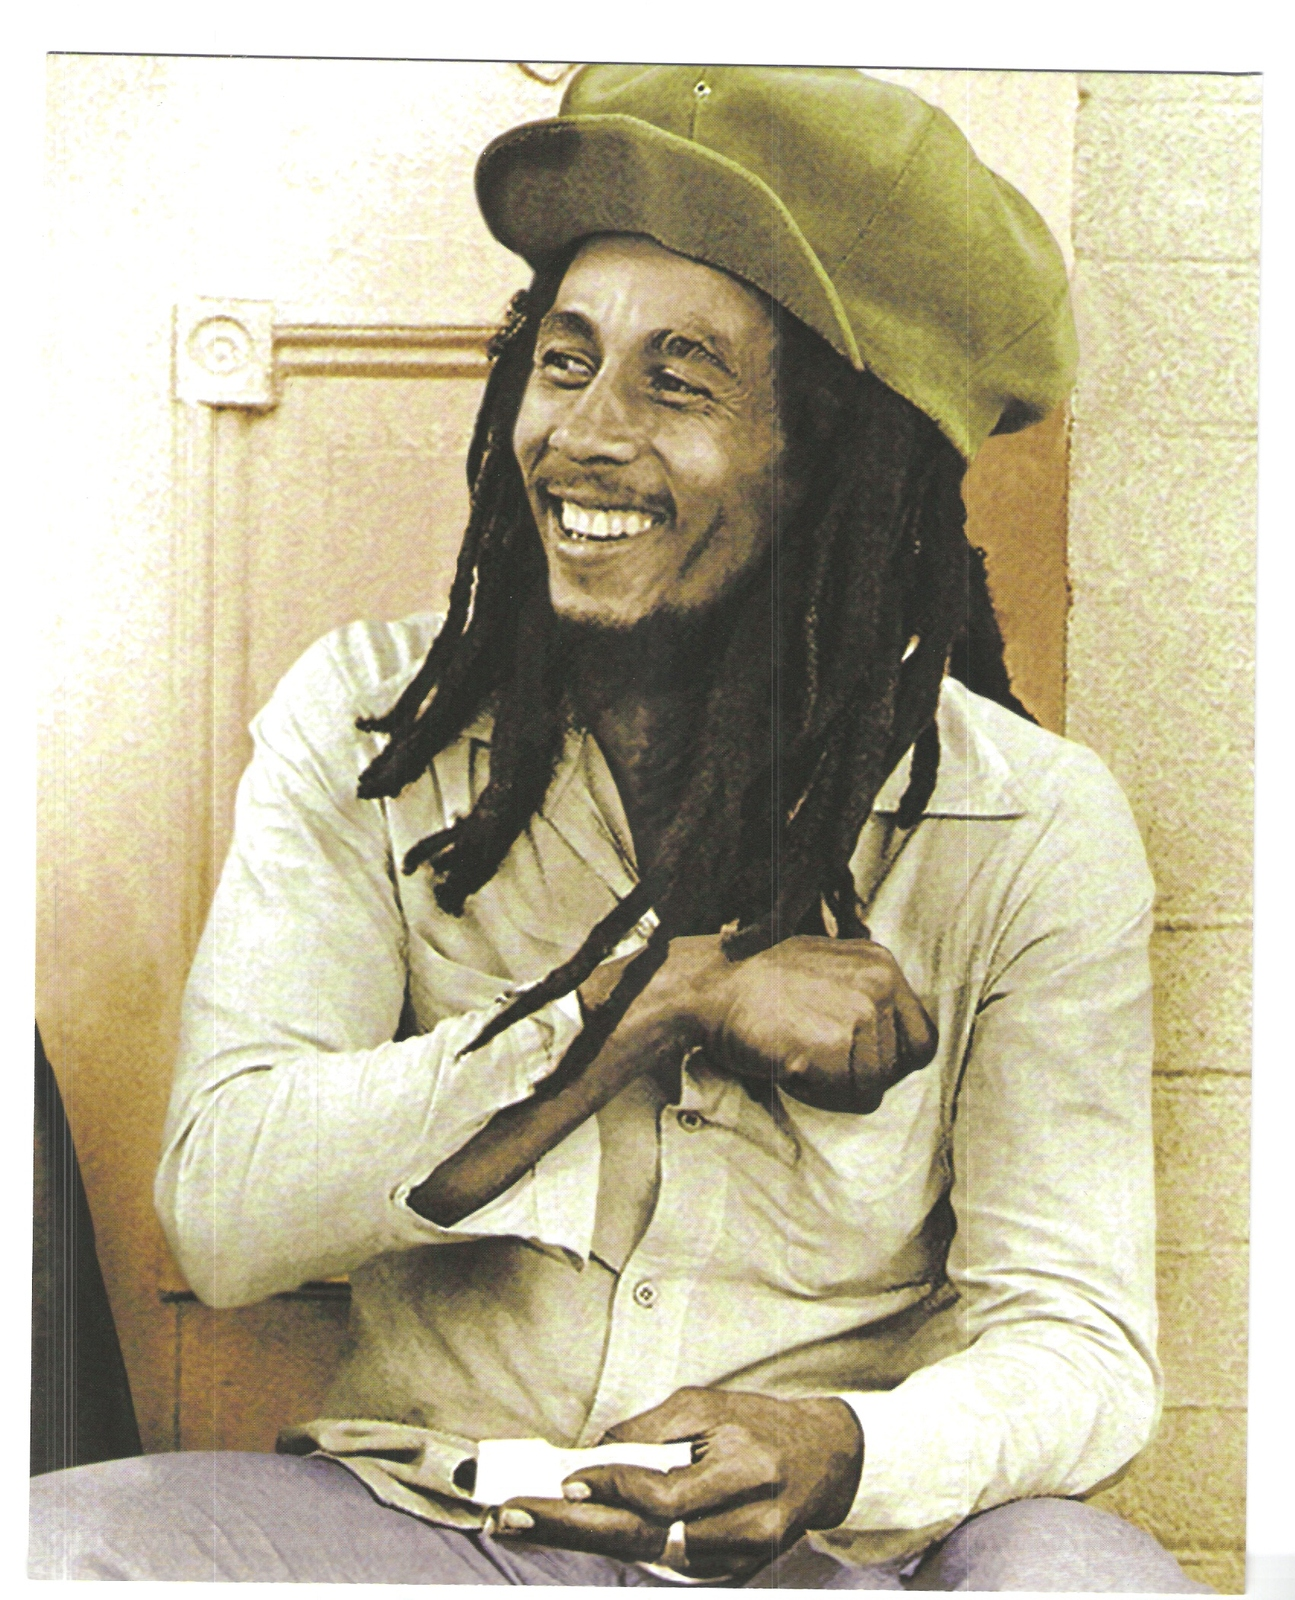 Bob Marley Spliff Roller Vintage 18X24 Color Reggae Music Memorabilia Photo - $35.95